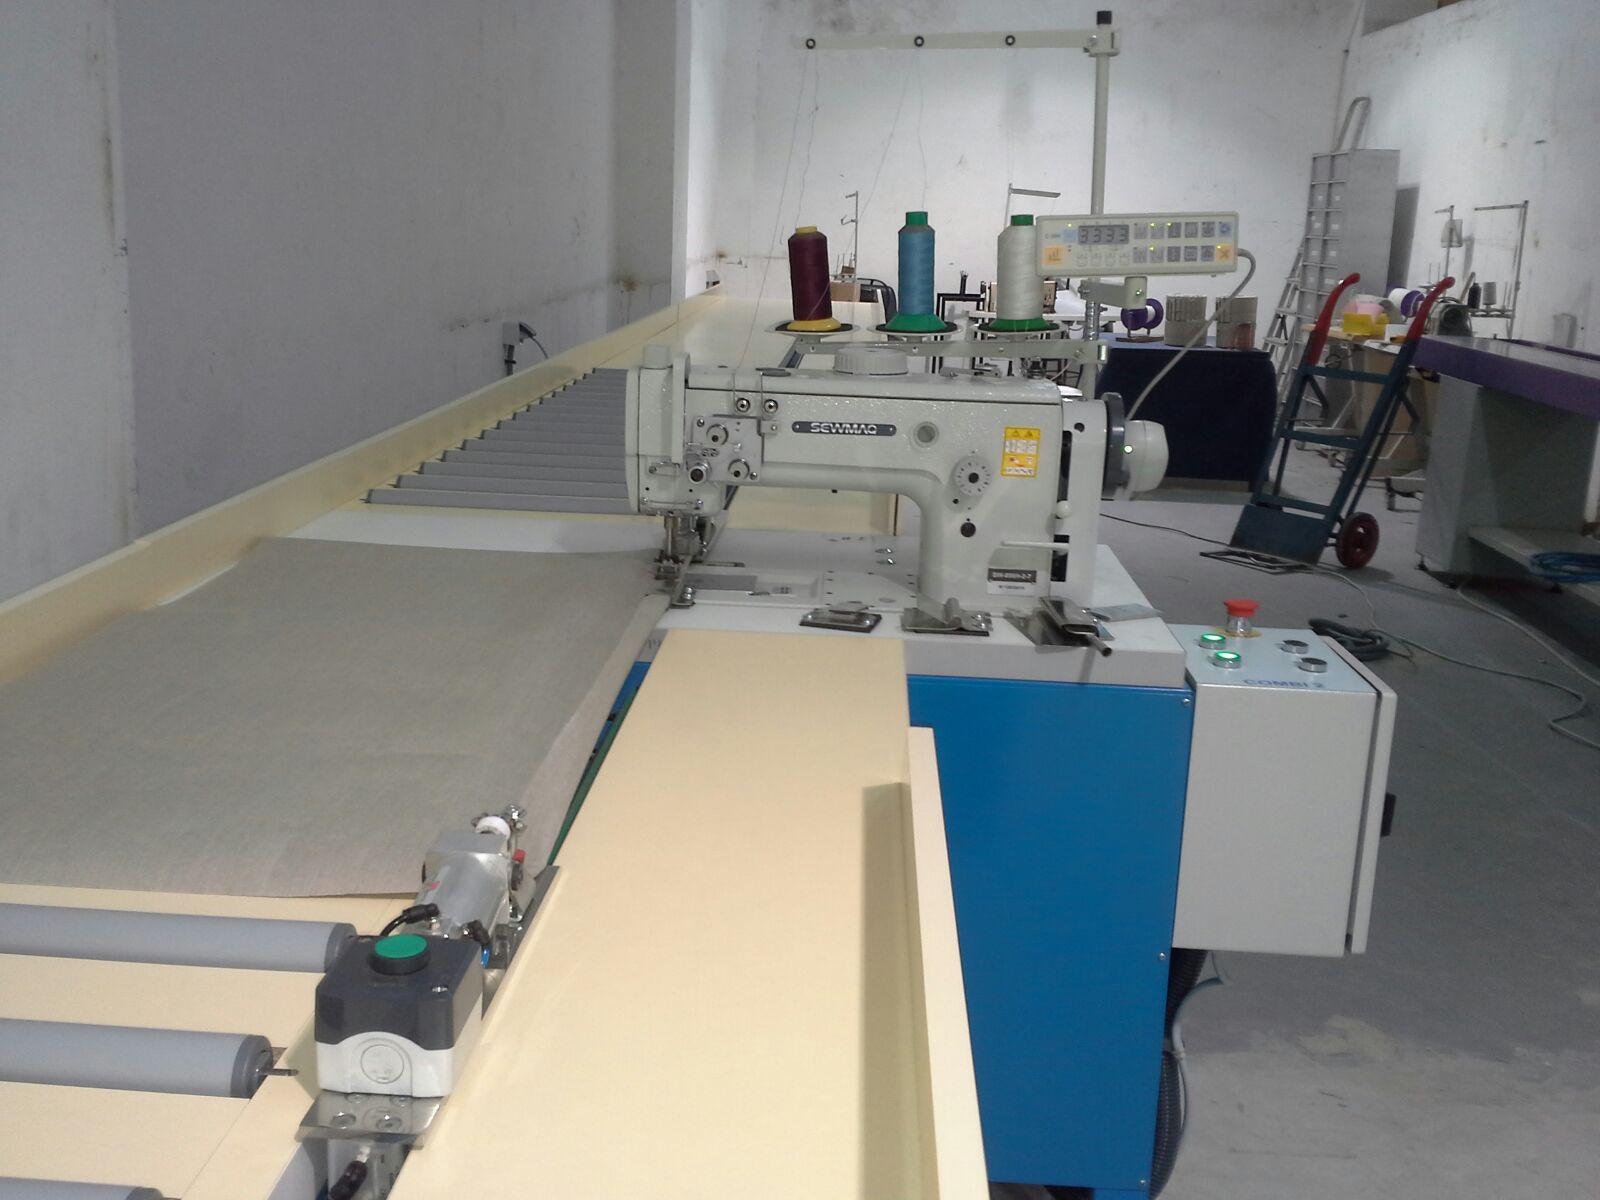 Guiatec guias para la confeccion guias para coser toldos for Maquina para toldos